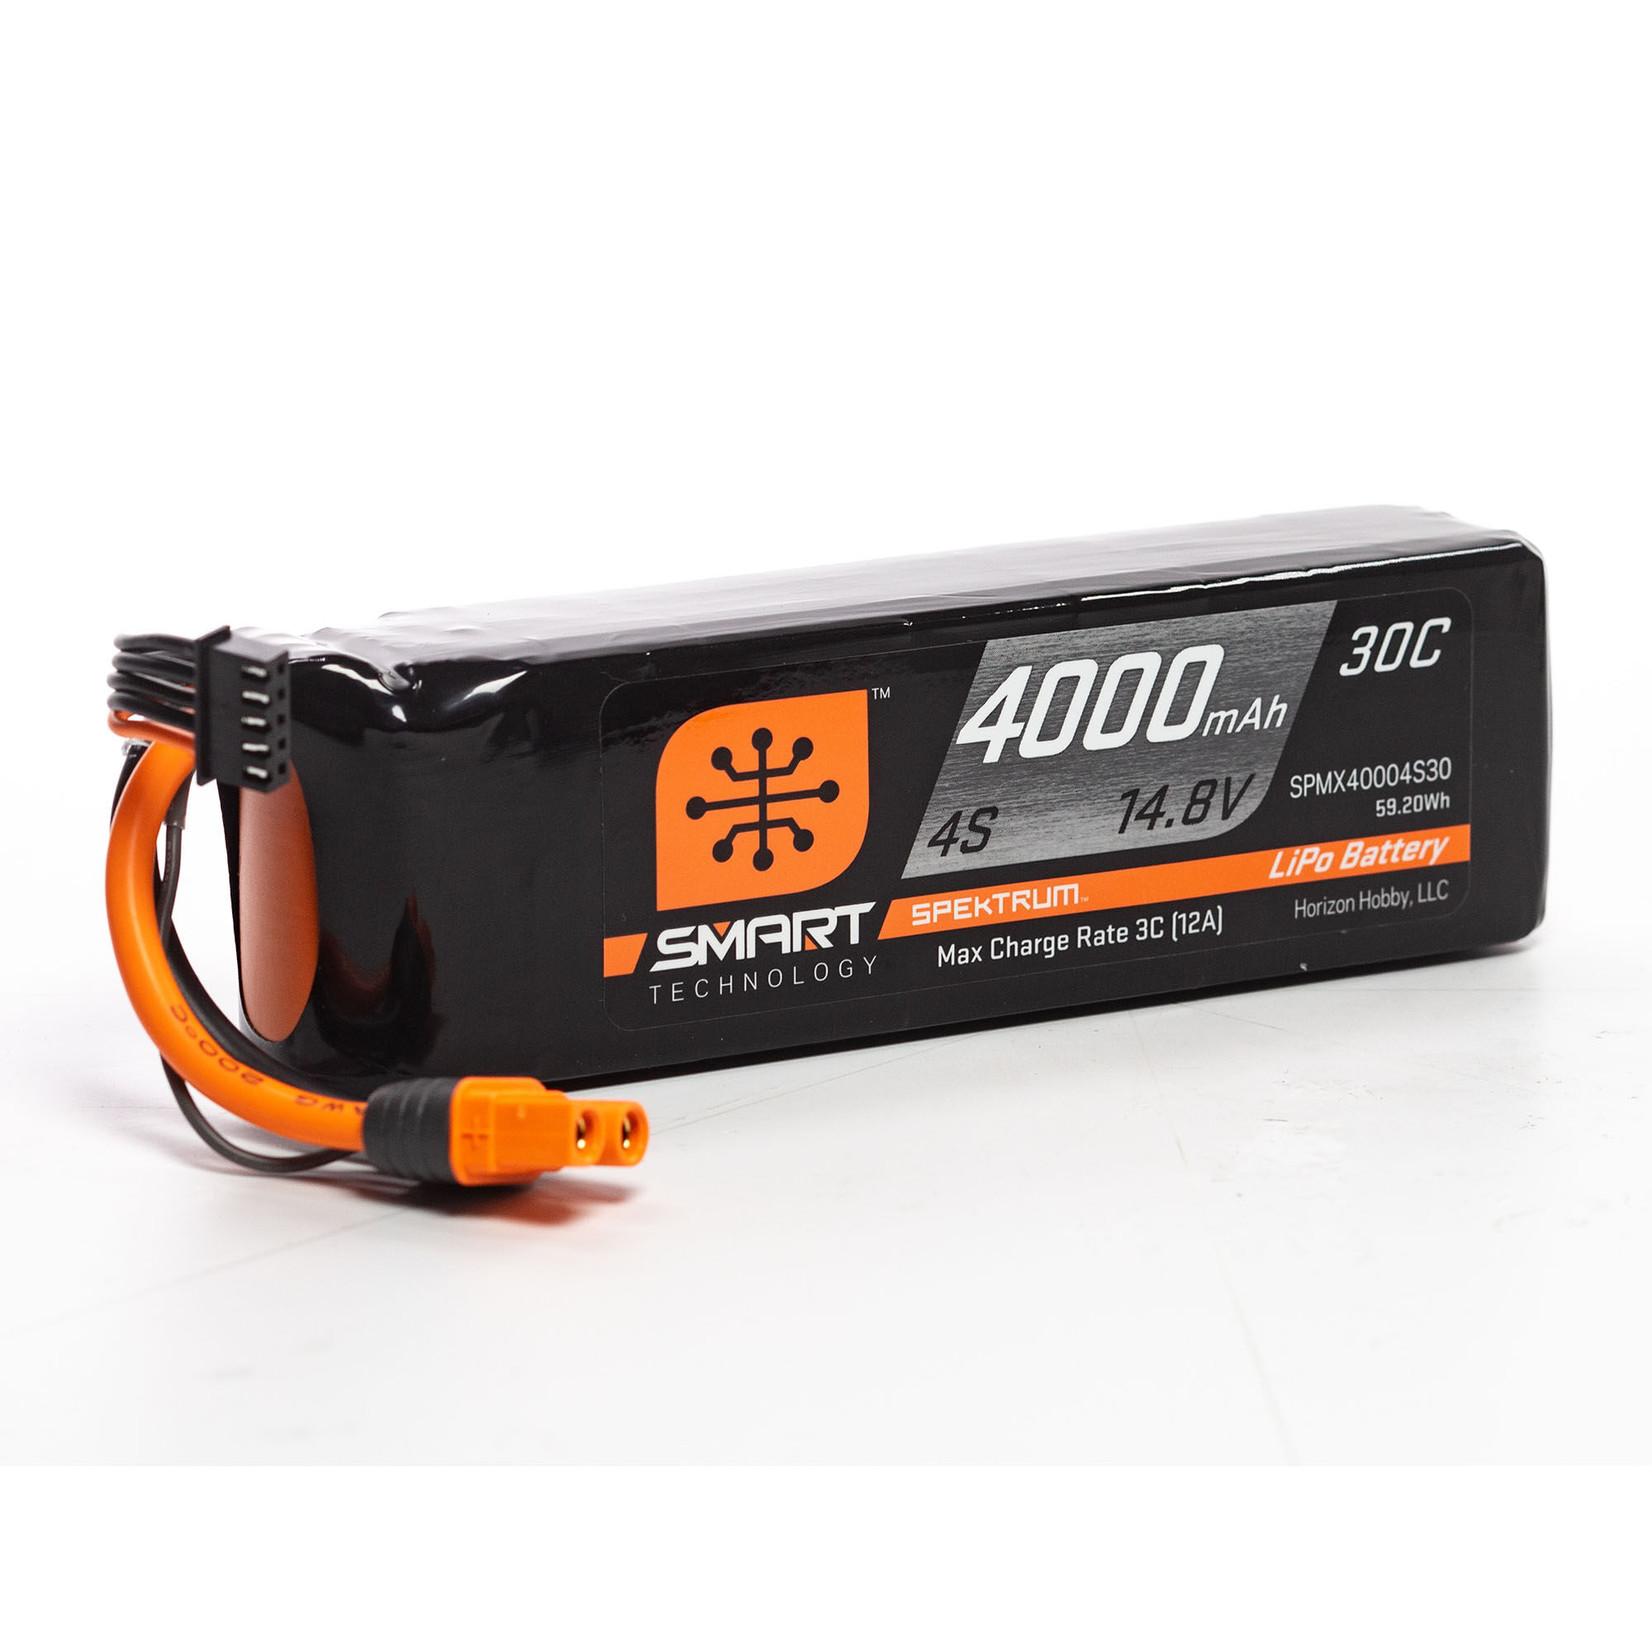 Spektrum SPMX40004S30 Spektrum 4000mAh 4S 14.8V Smart LiPo Battery 30C; IC3